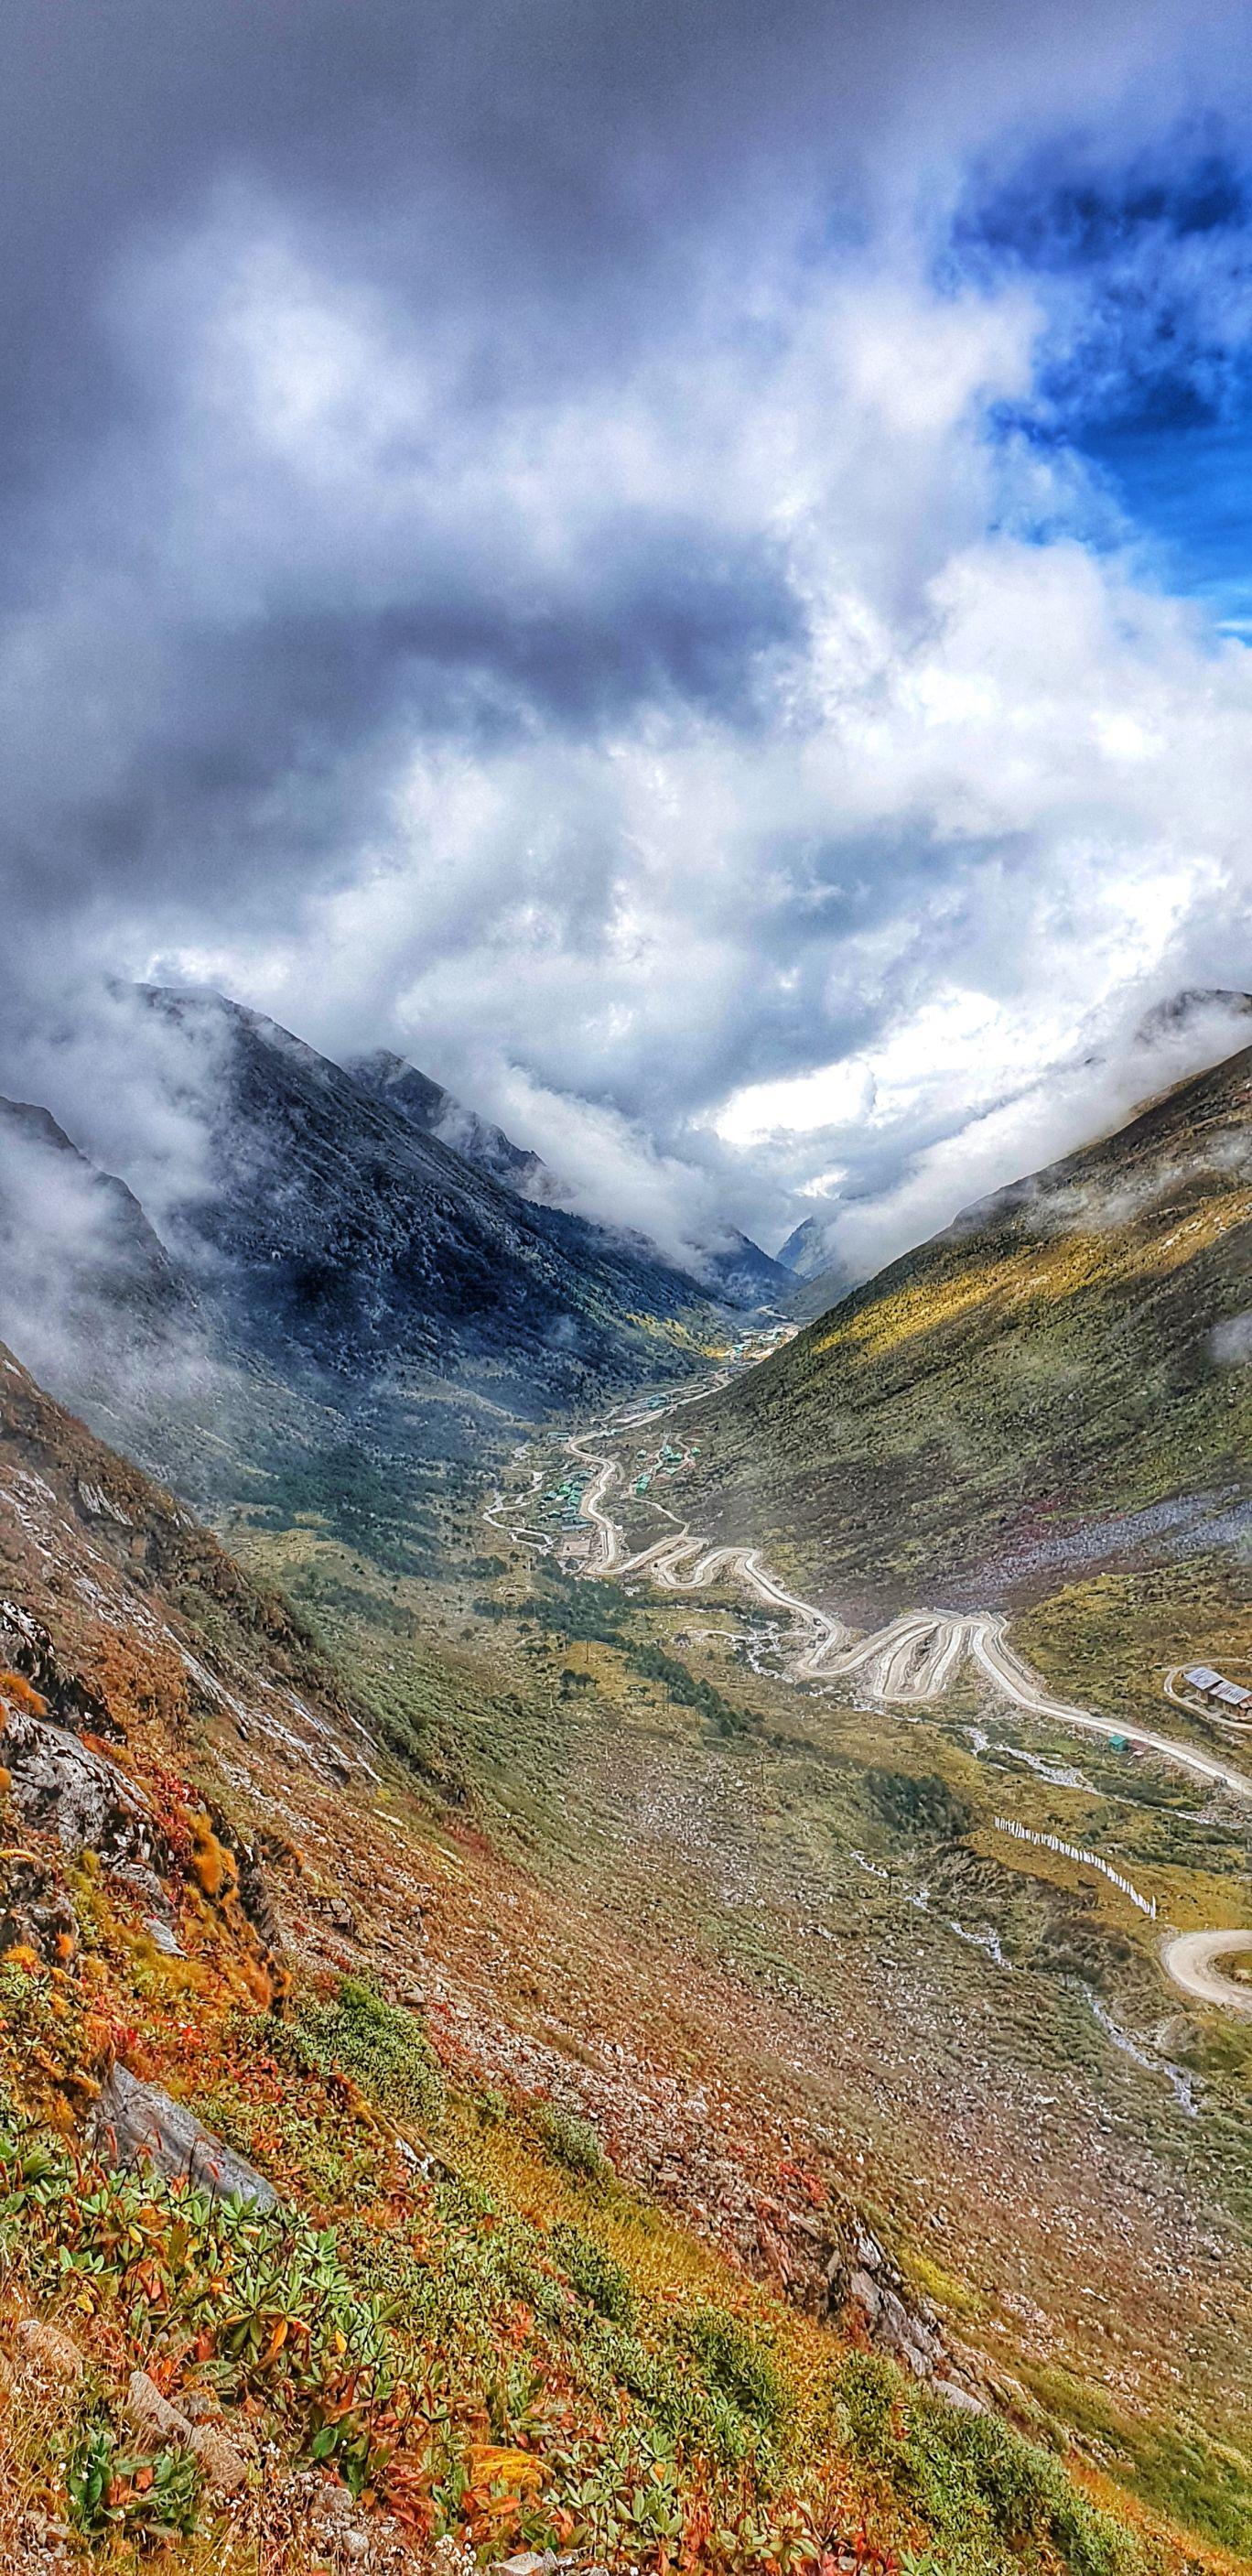 Photo of Sela Pass By Abhishek Mishra